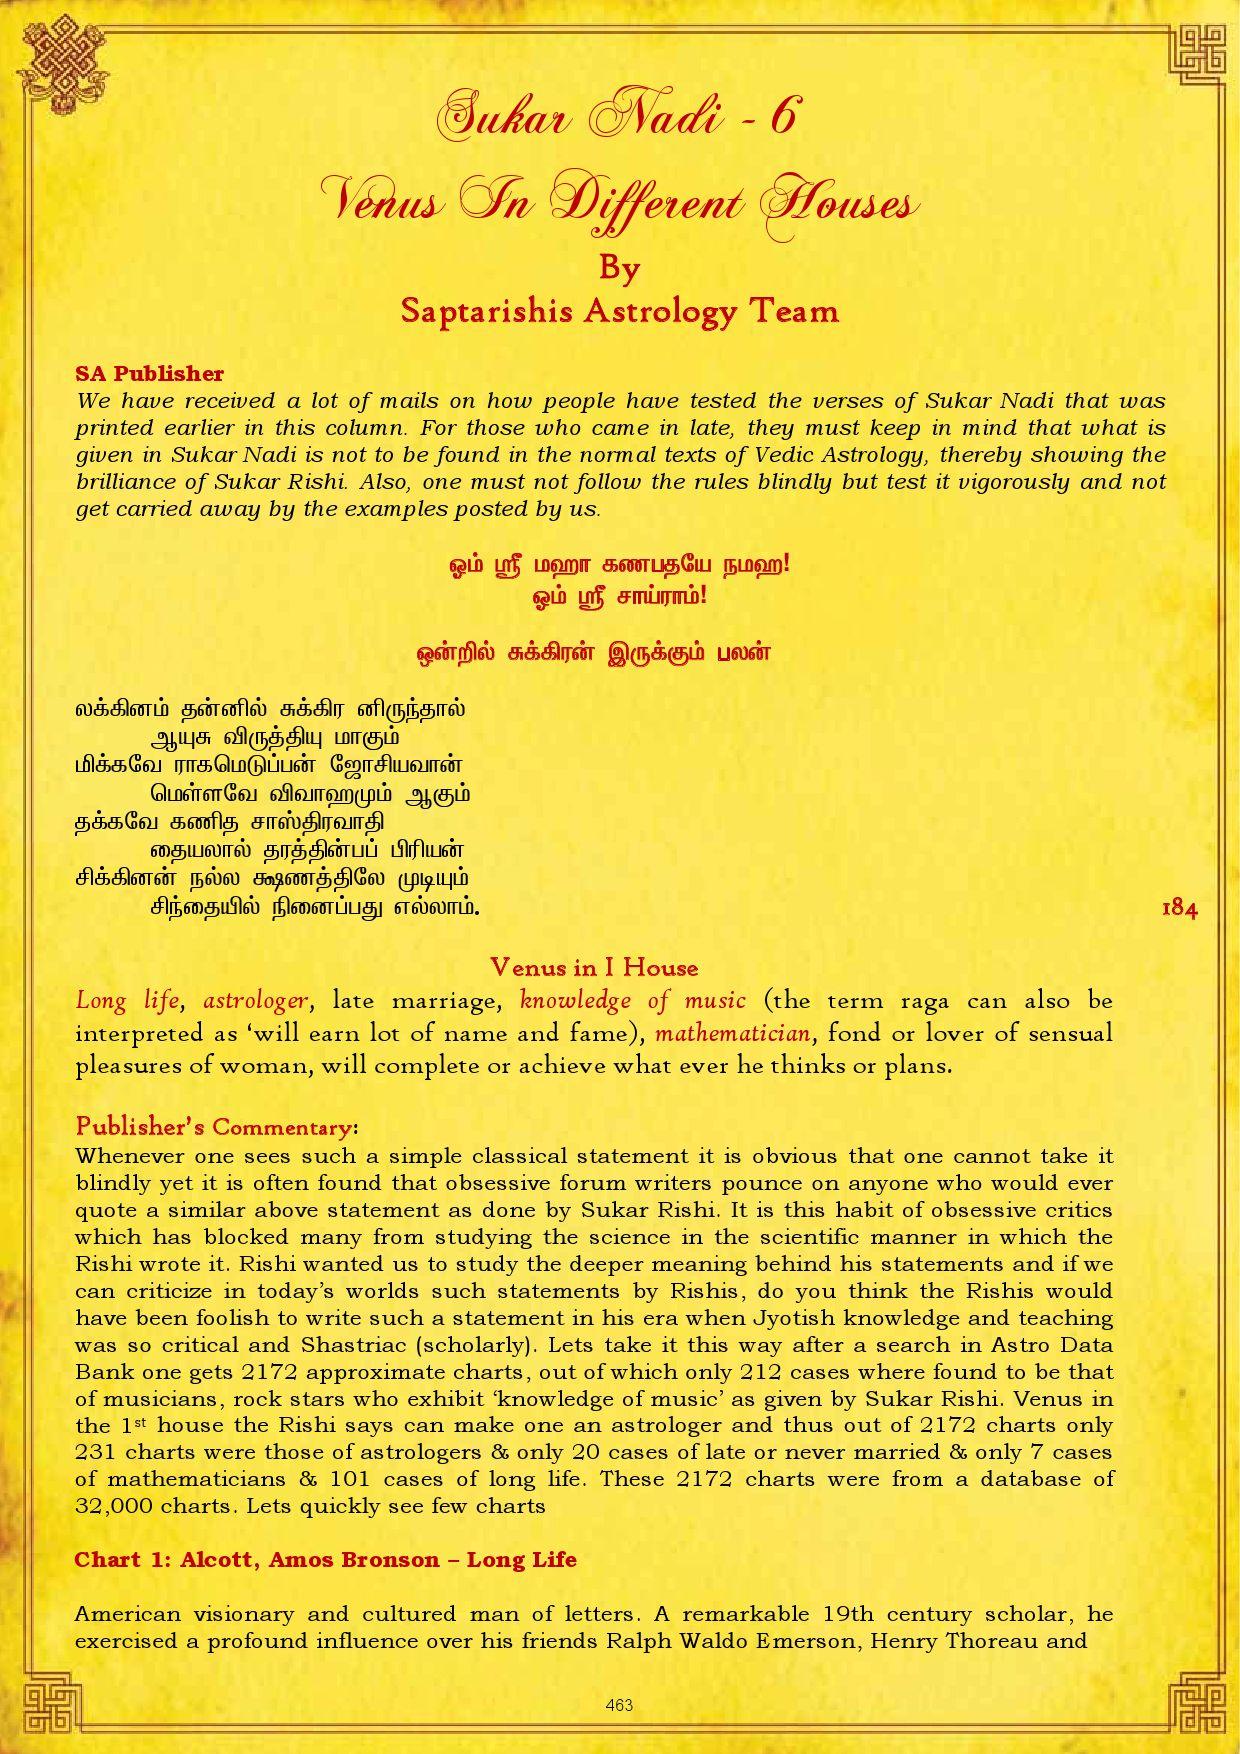 46-SukarNadi-6 by Saptarishis Astrology - issuu